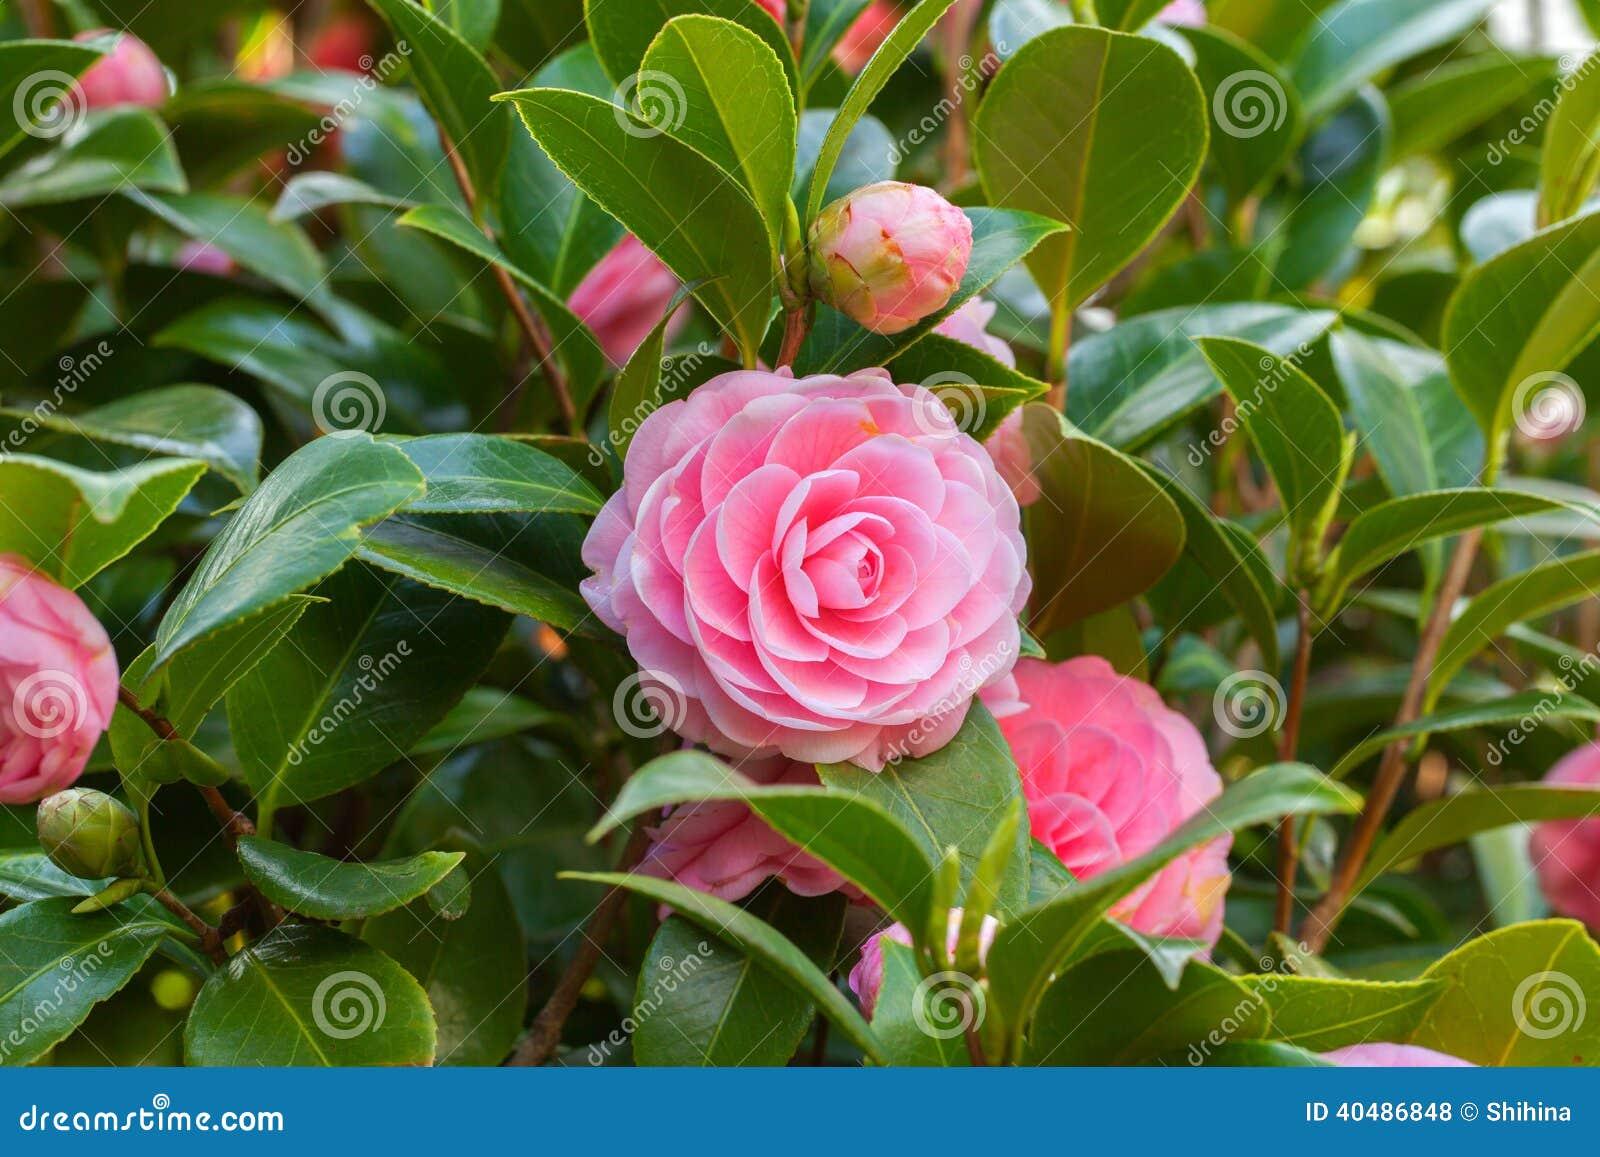 fleur rose de sasanqua de cam lia avec les feuilles vertes. Black Bedroom Furniture Sets. Home Design Ideas